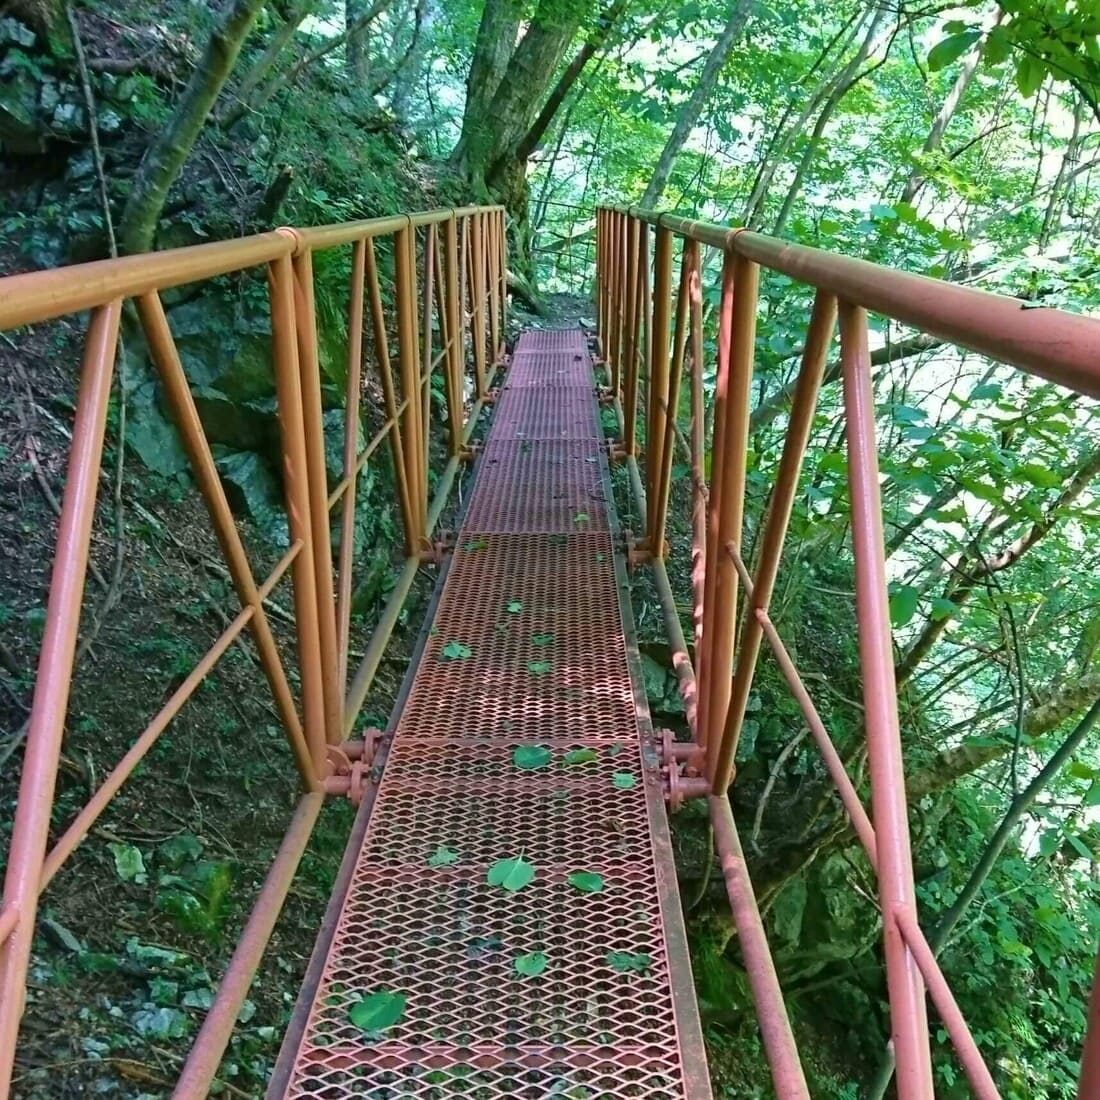 尾白川渓谷登山道の鉄橋